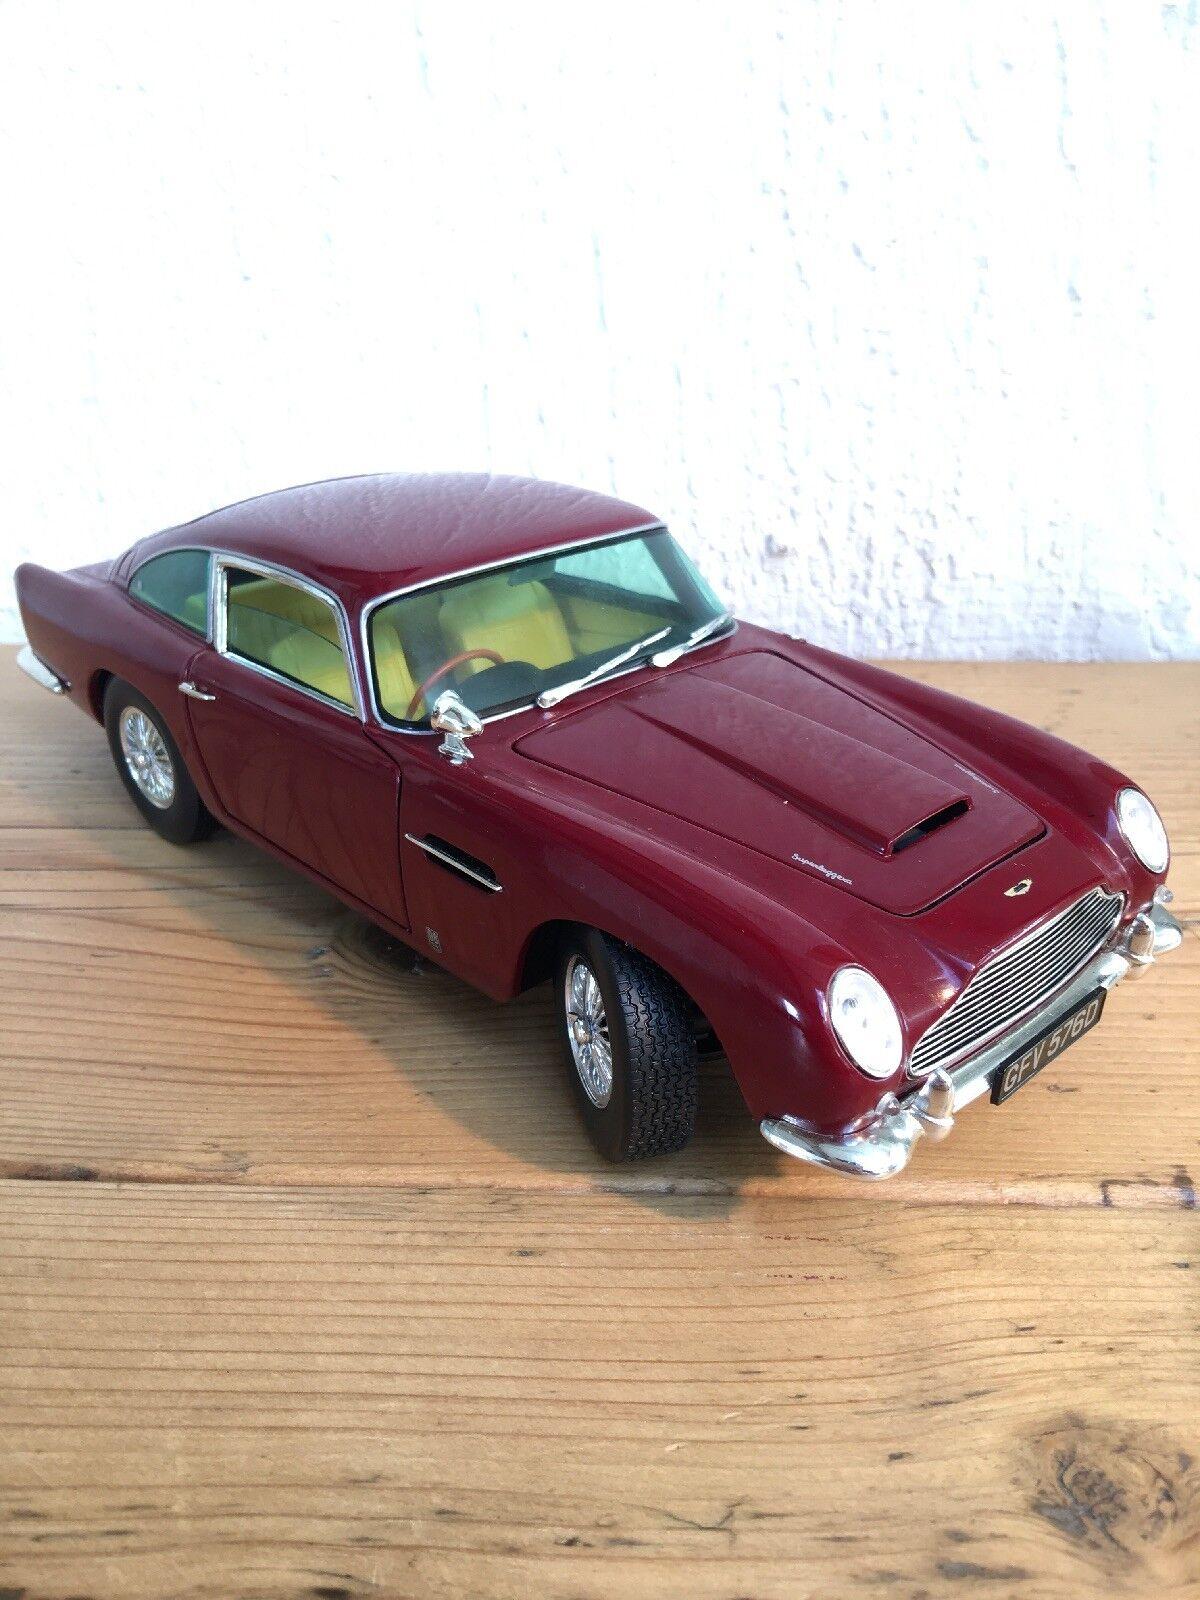 Chrono 1 18th scale Aston Martin DB5 die-cast model